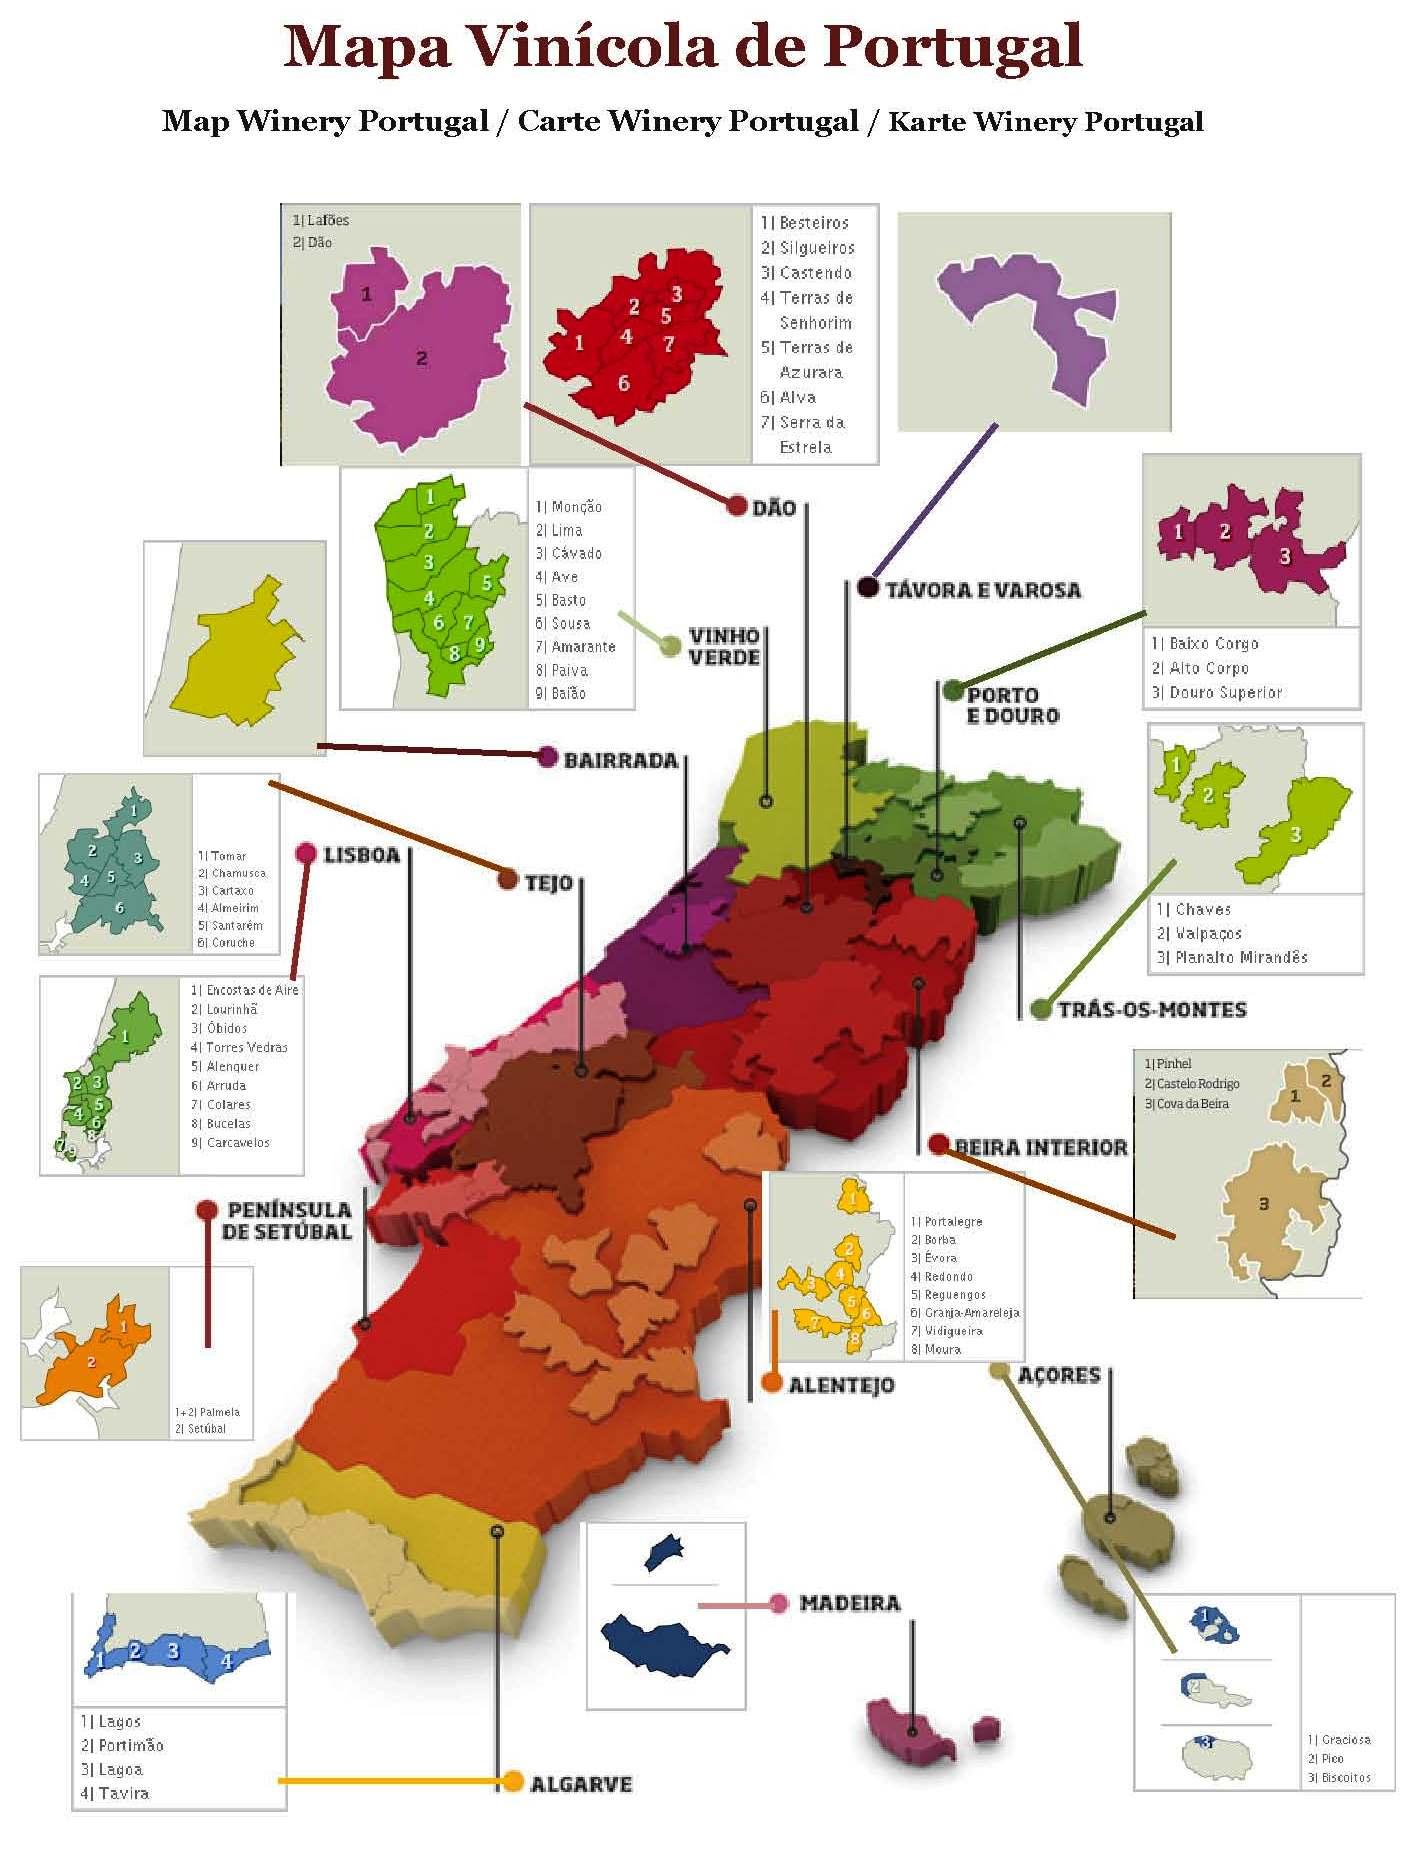 sapo mapa de portugal Mapa Vinícola de Portugal   TURIVENTOS   Turismo e Eventos sapo mapa de portugal